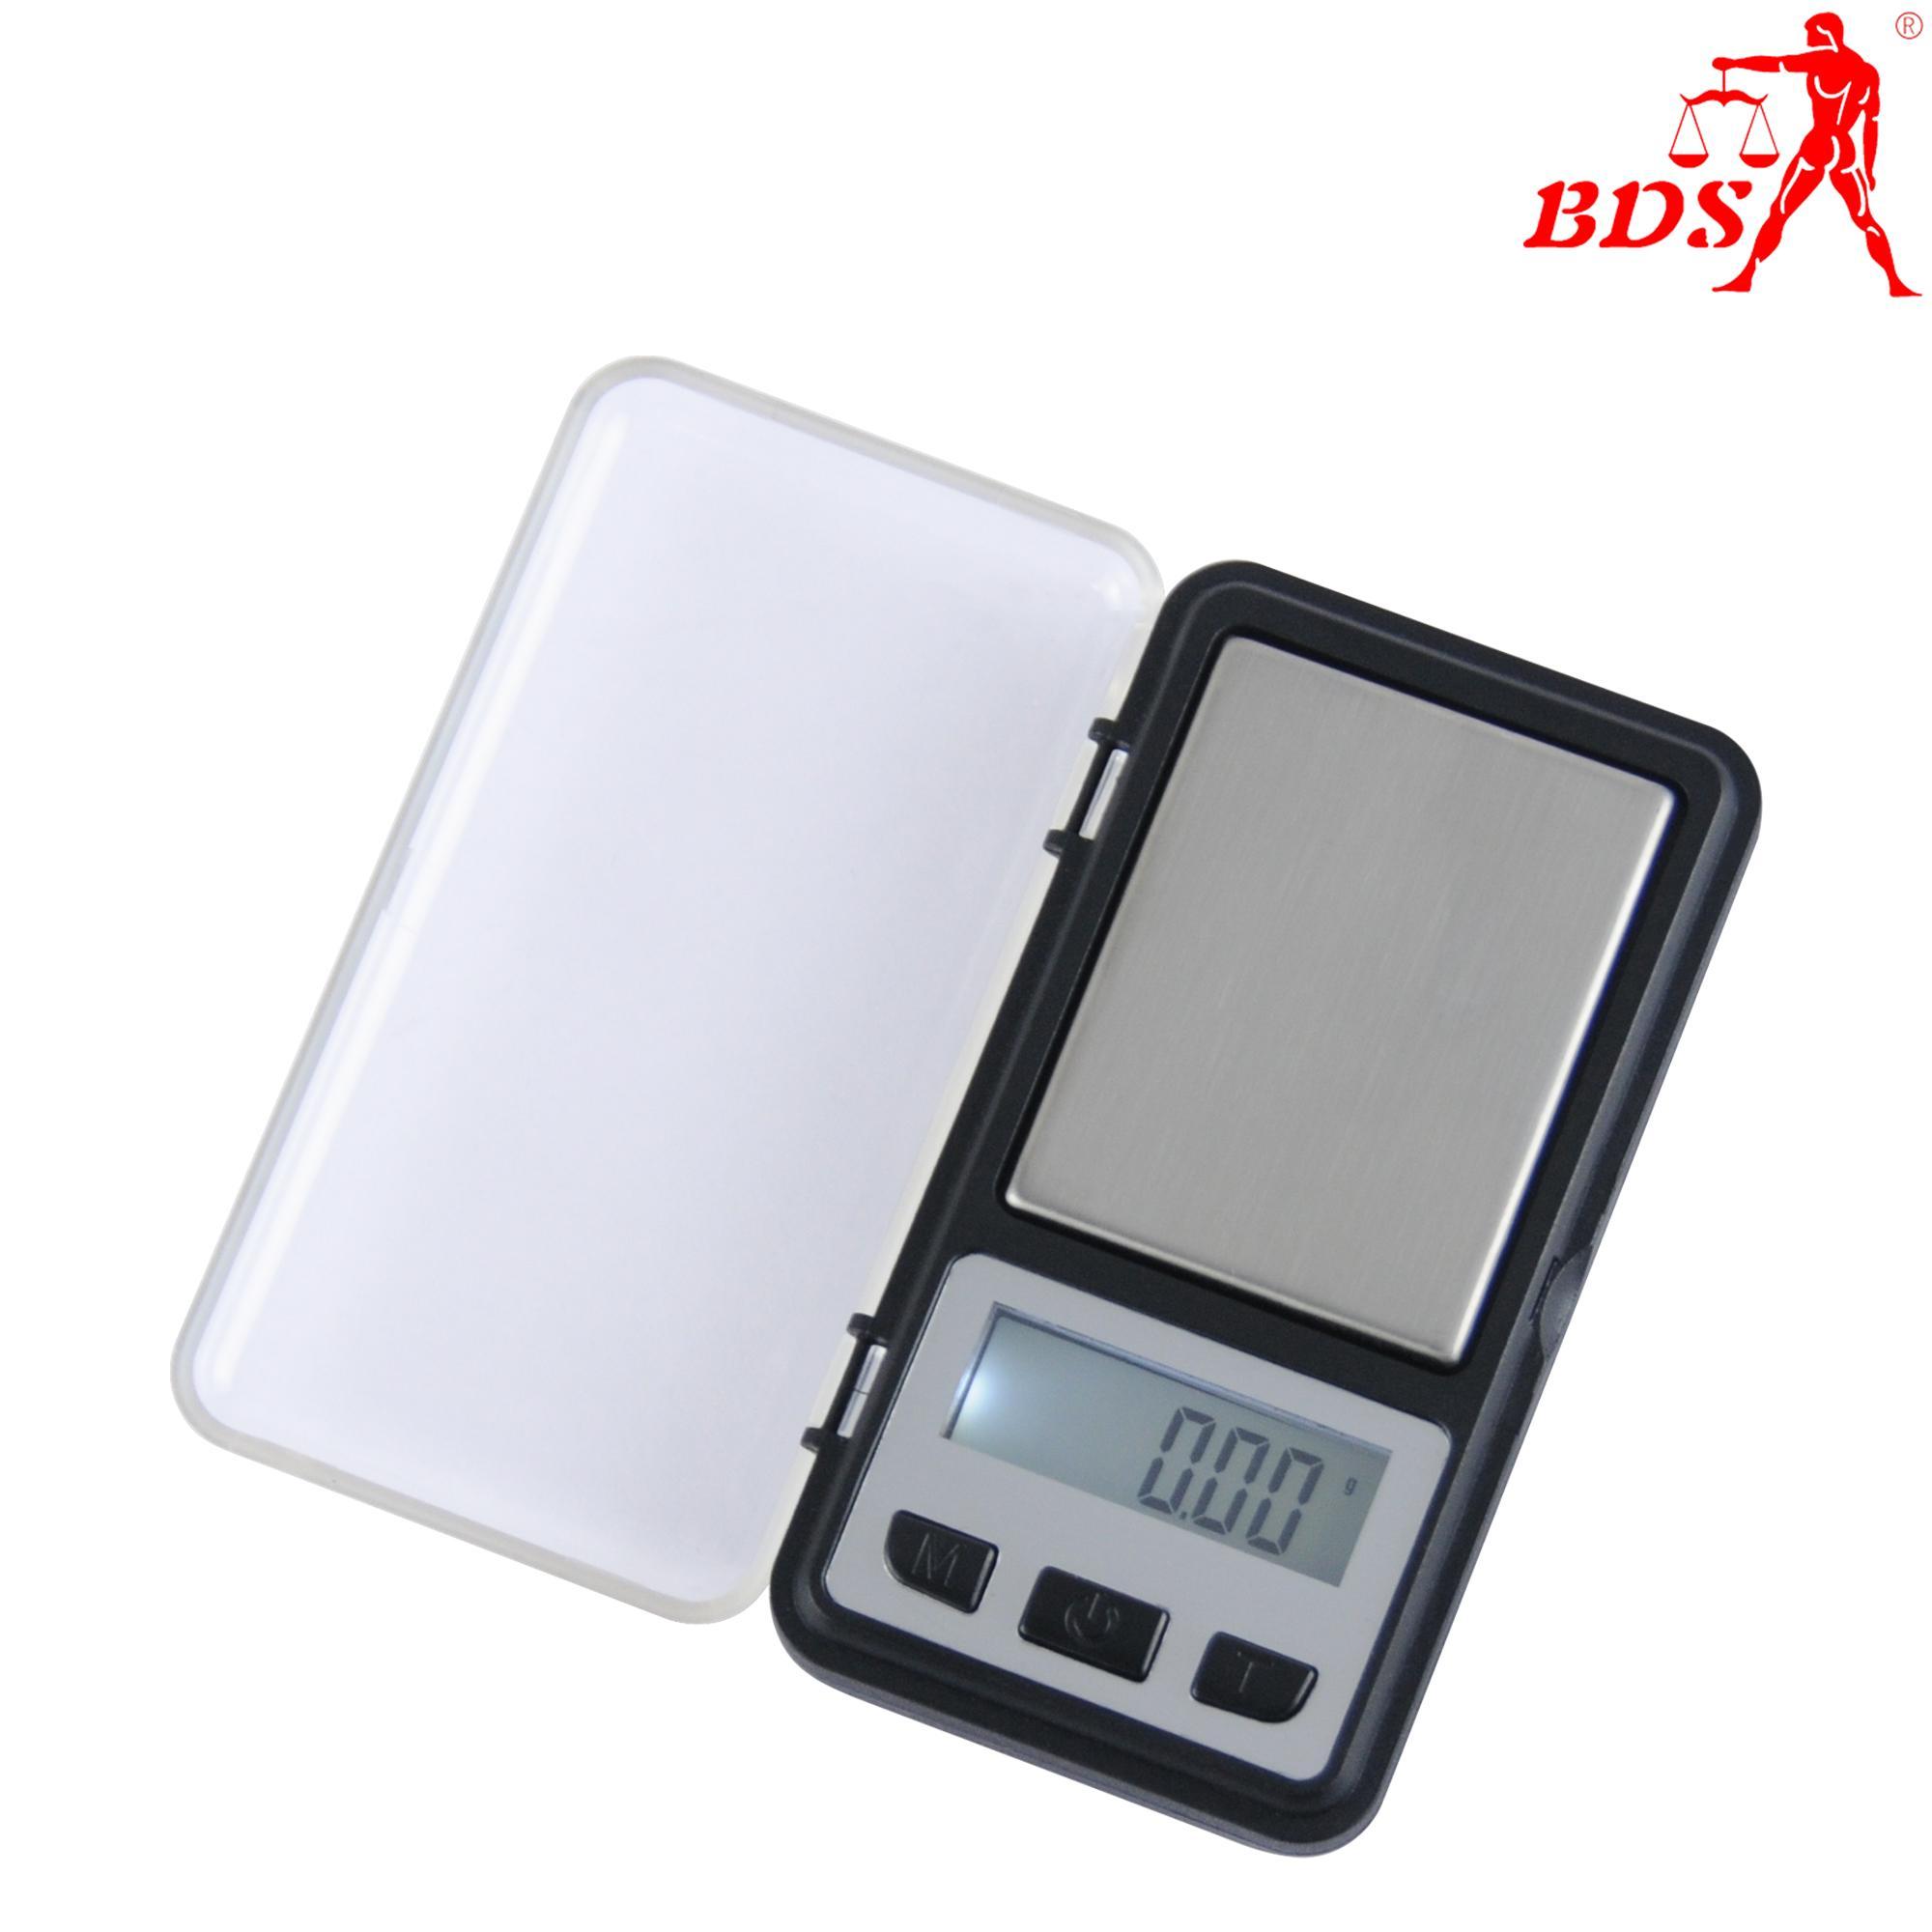 BDS6010便攜式電子口袋珠寶秤 2